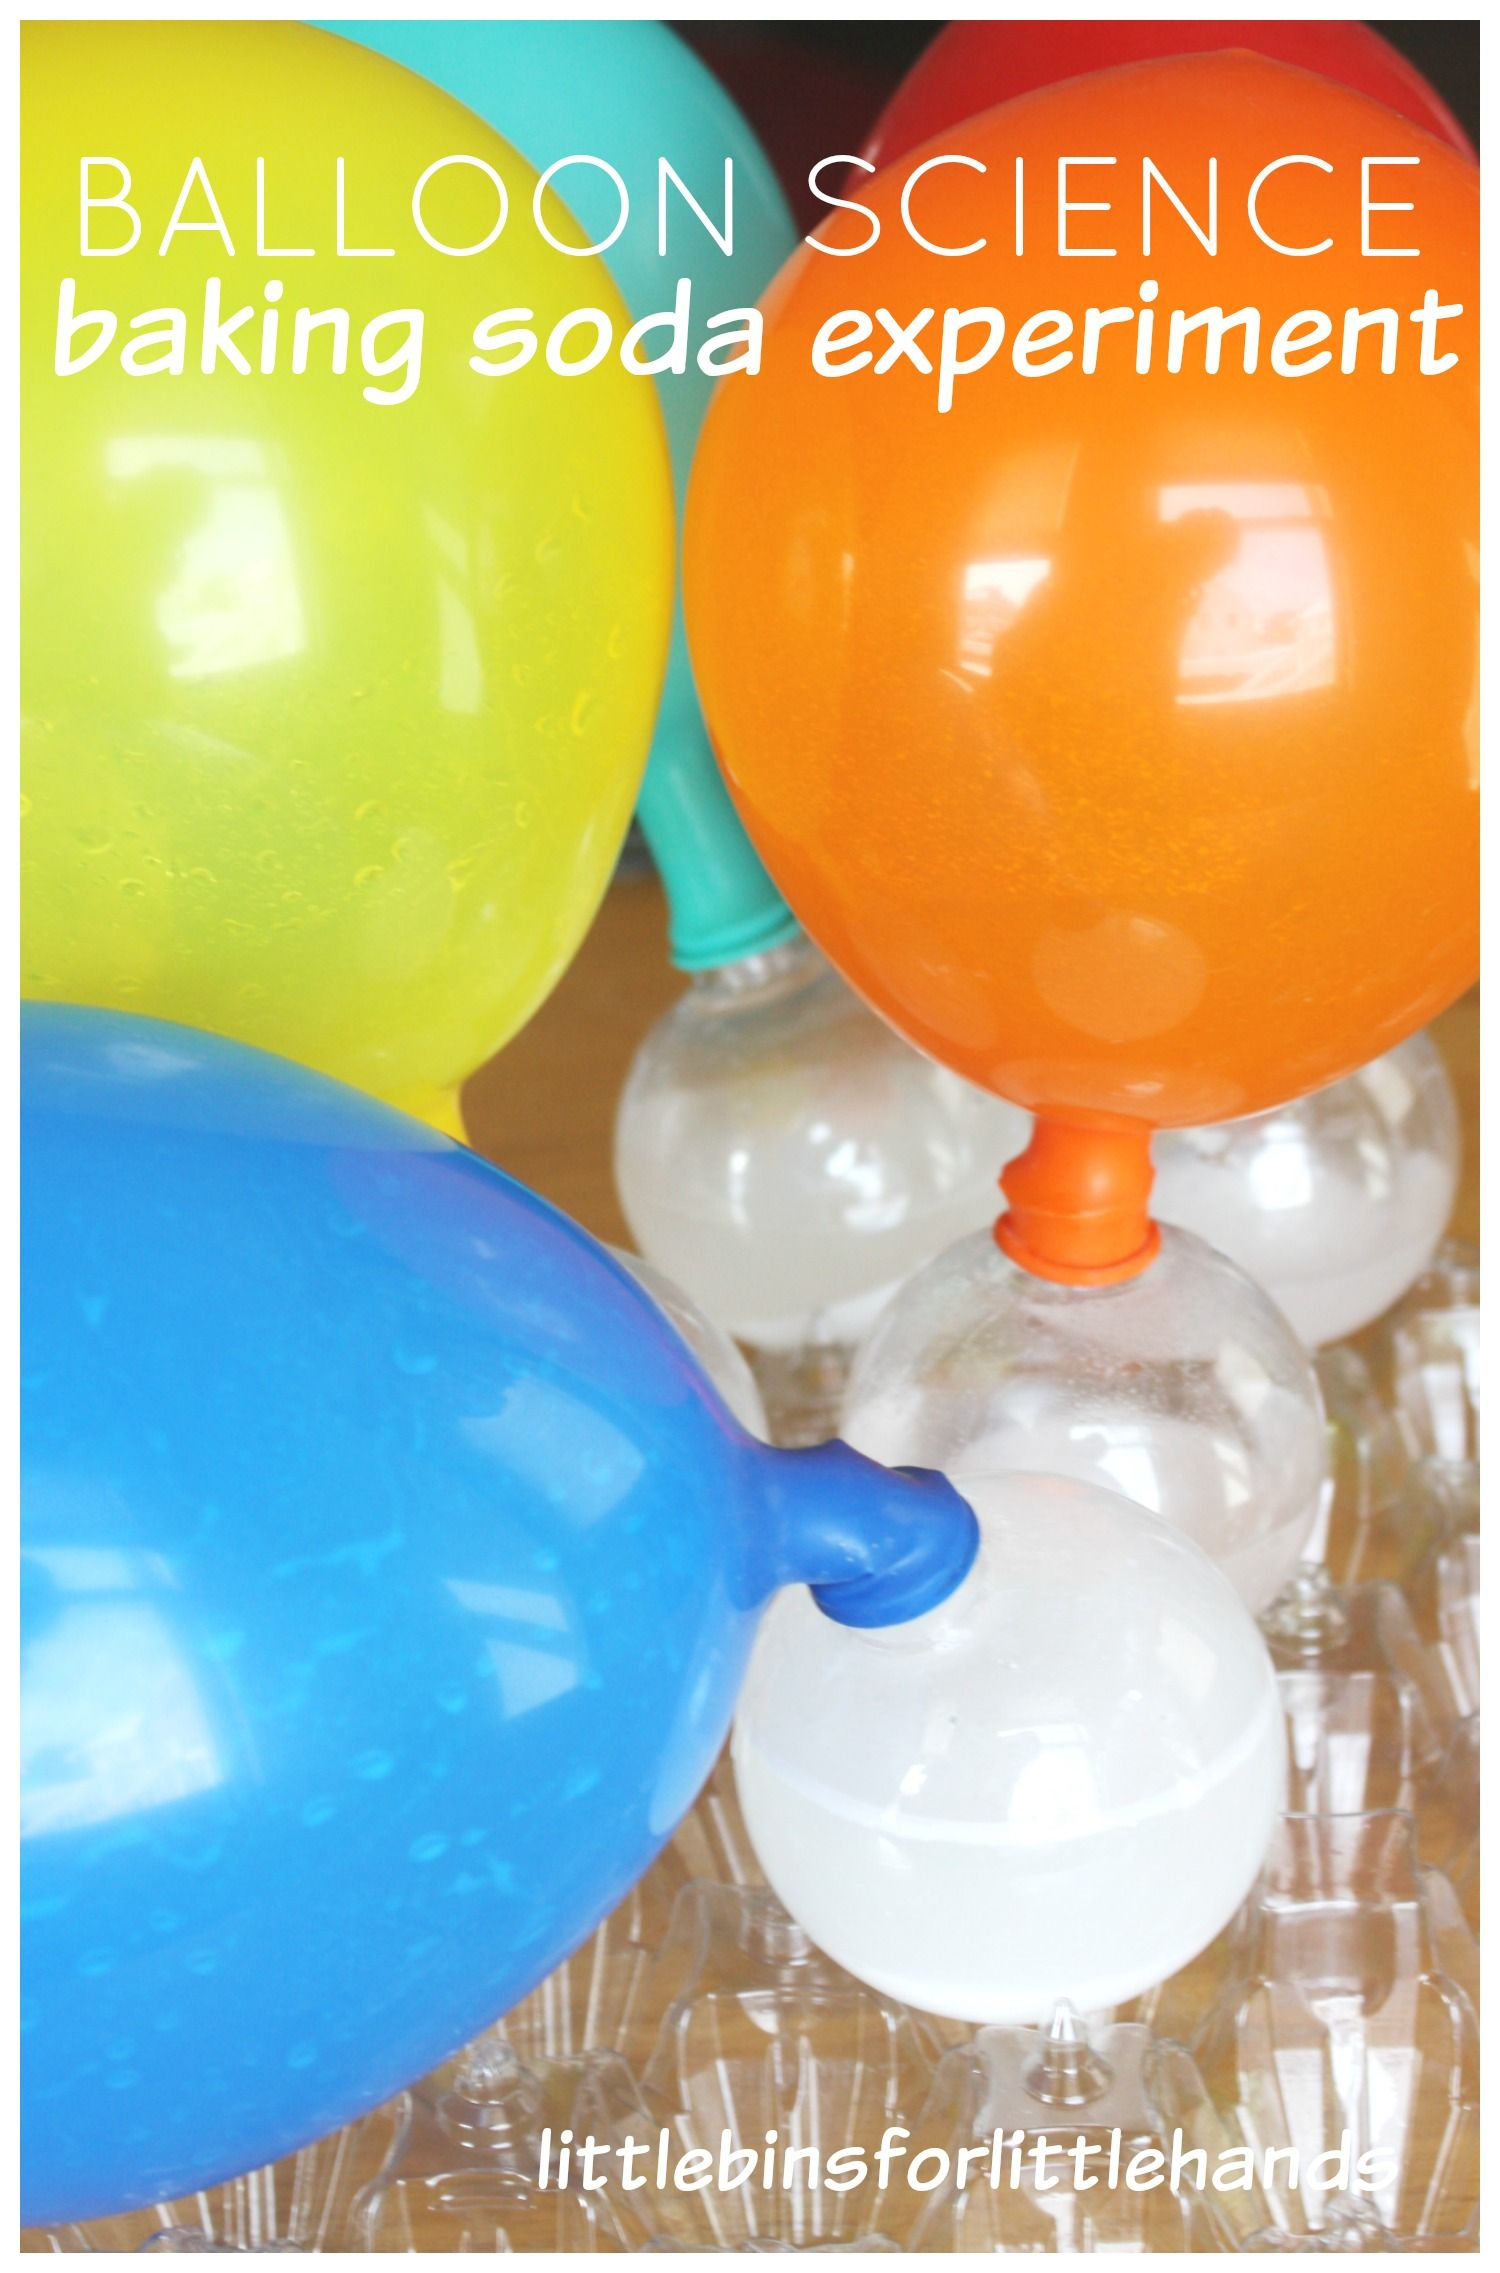 Baking Soda And Vinegar Balloon Experiment For Kids